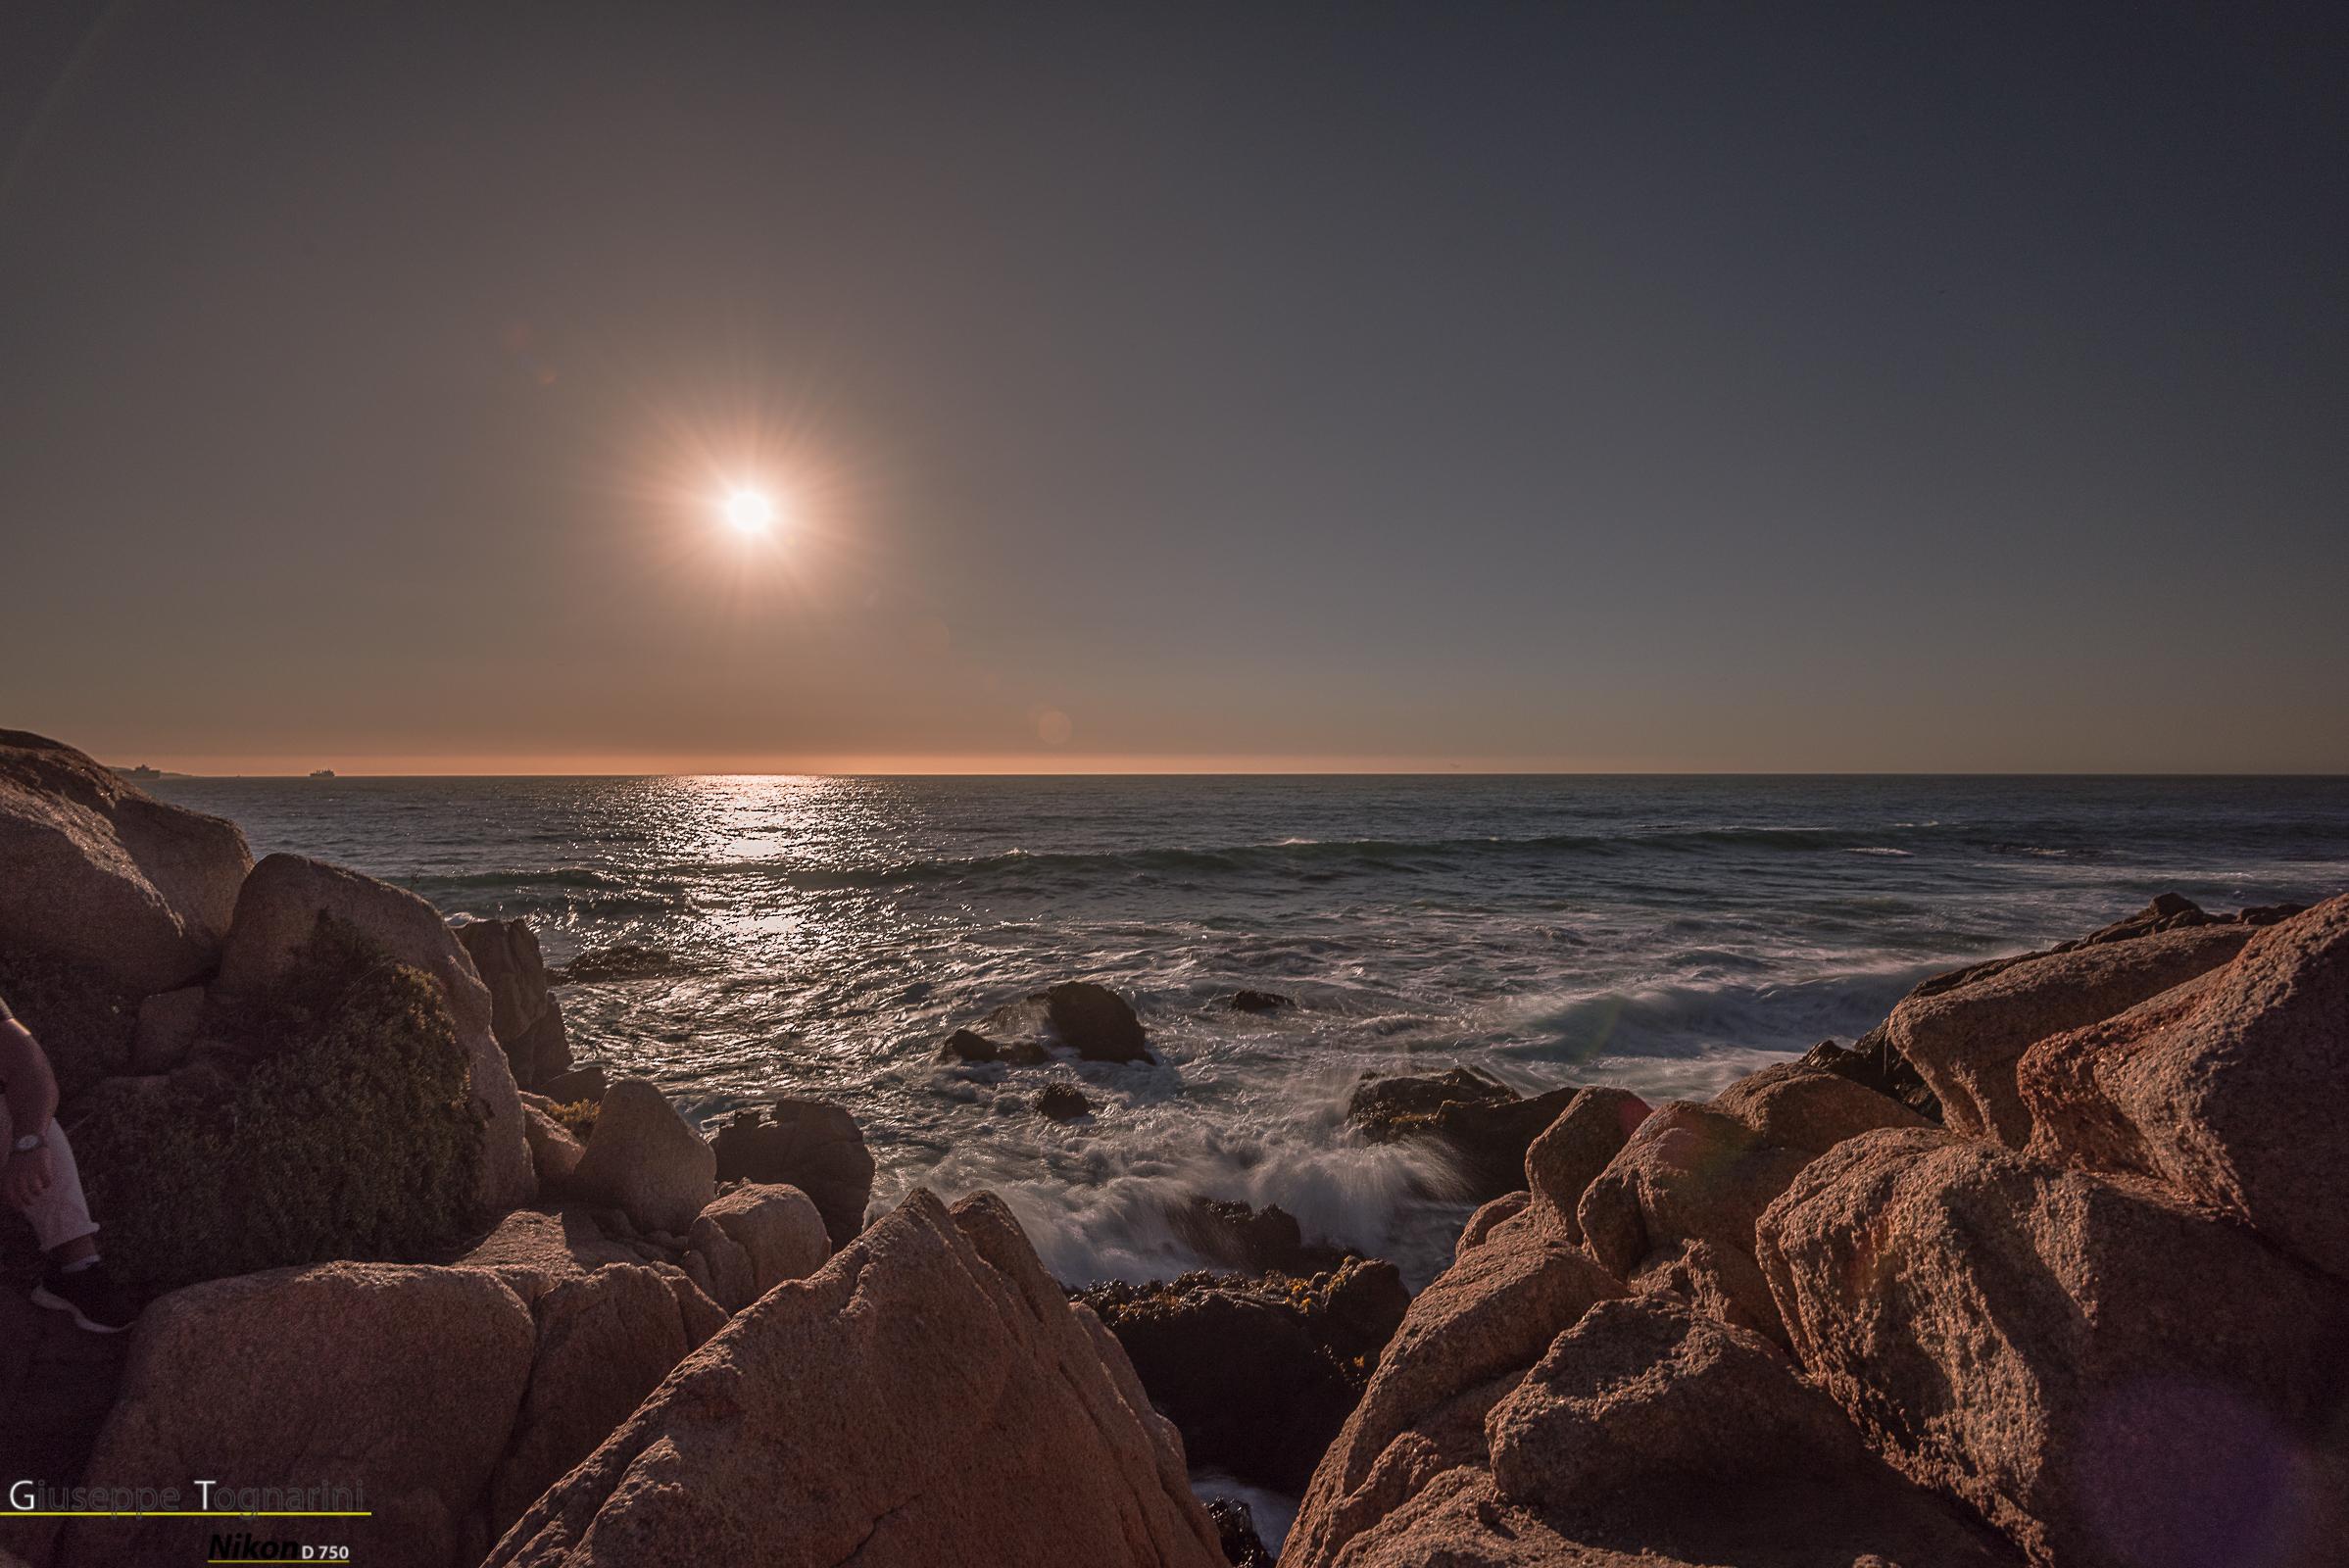 Finally the Pacific (Chilean coast)...